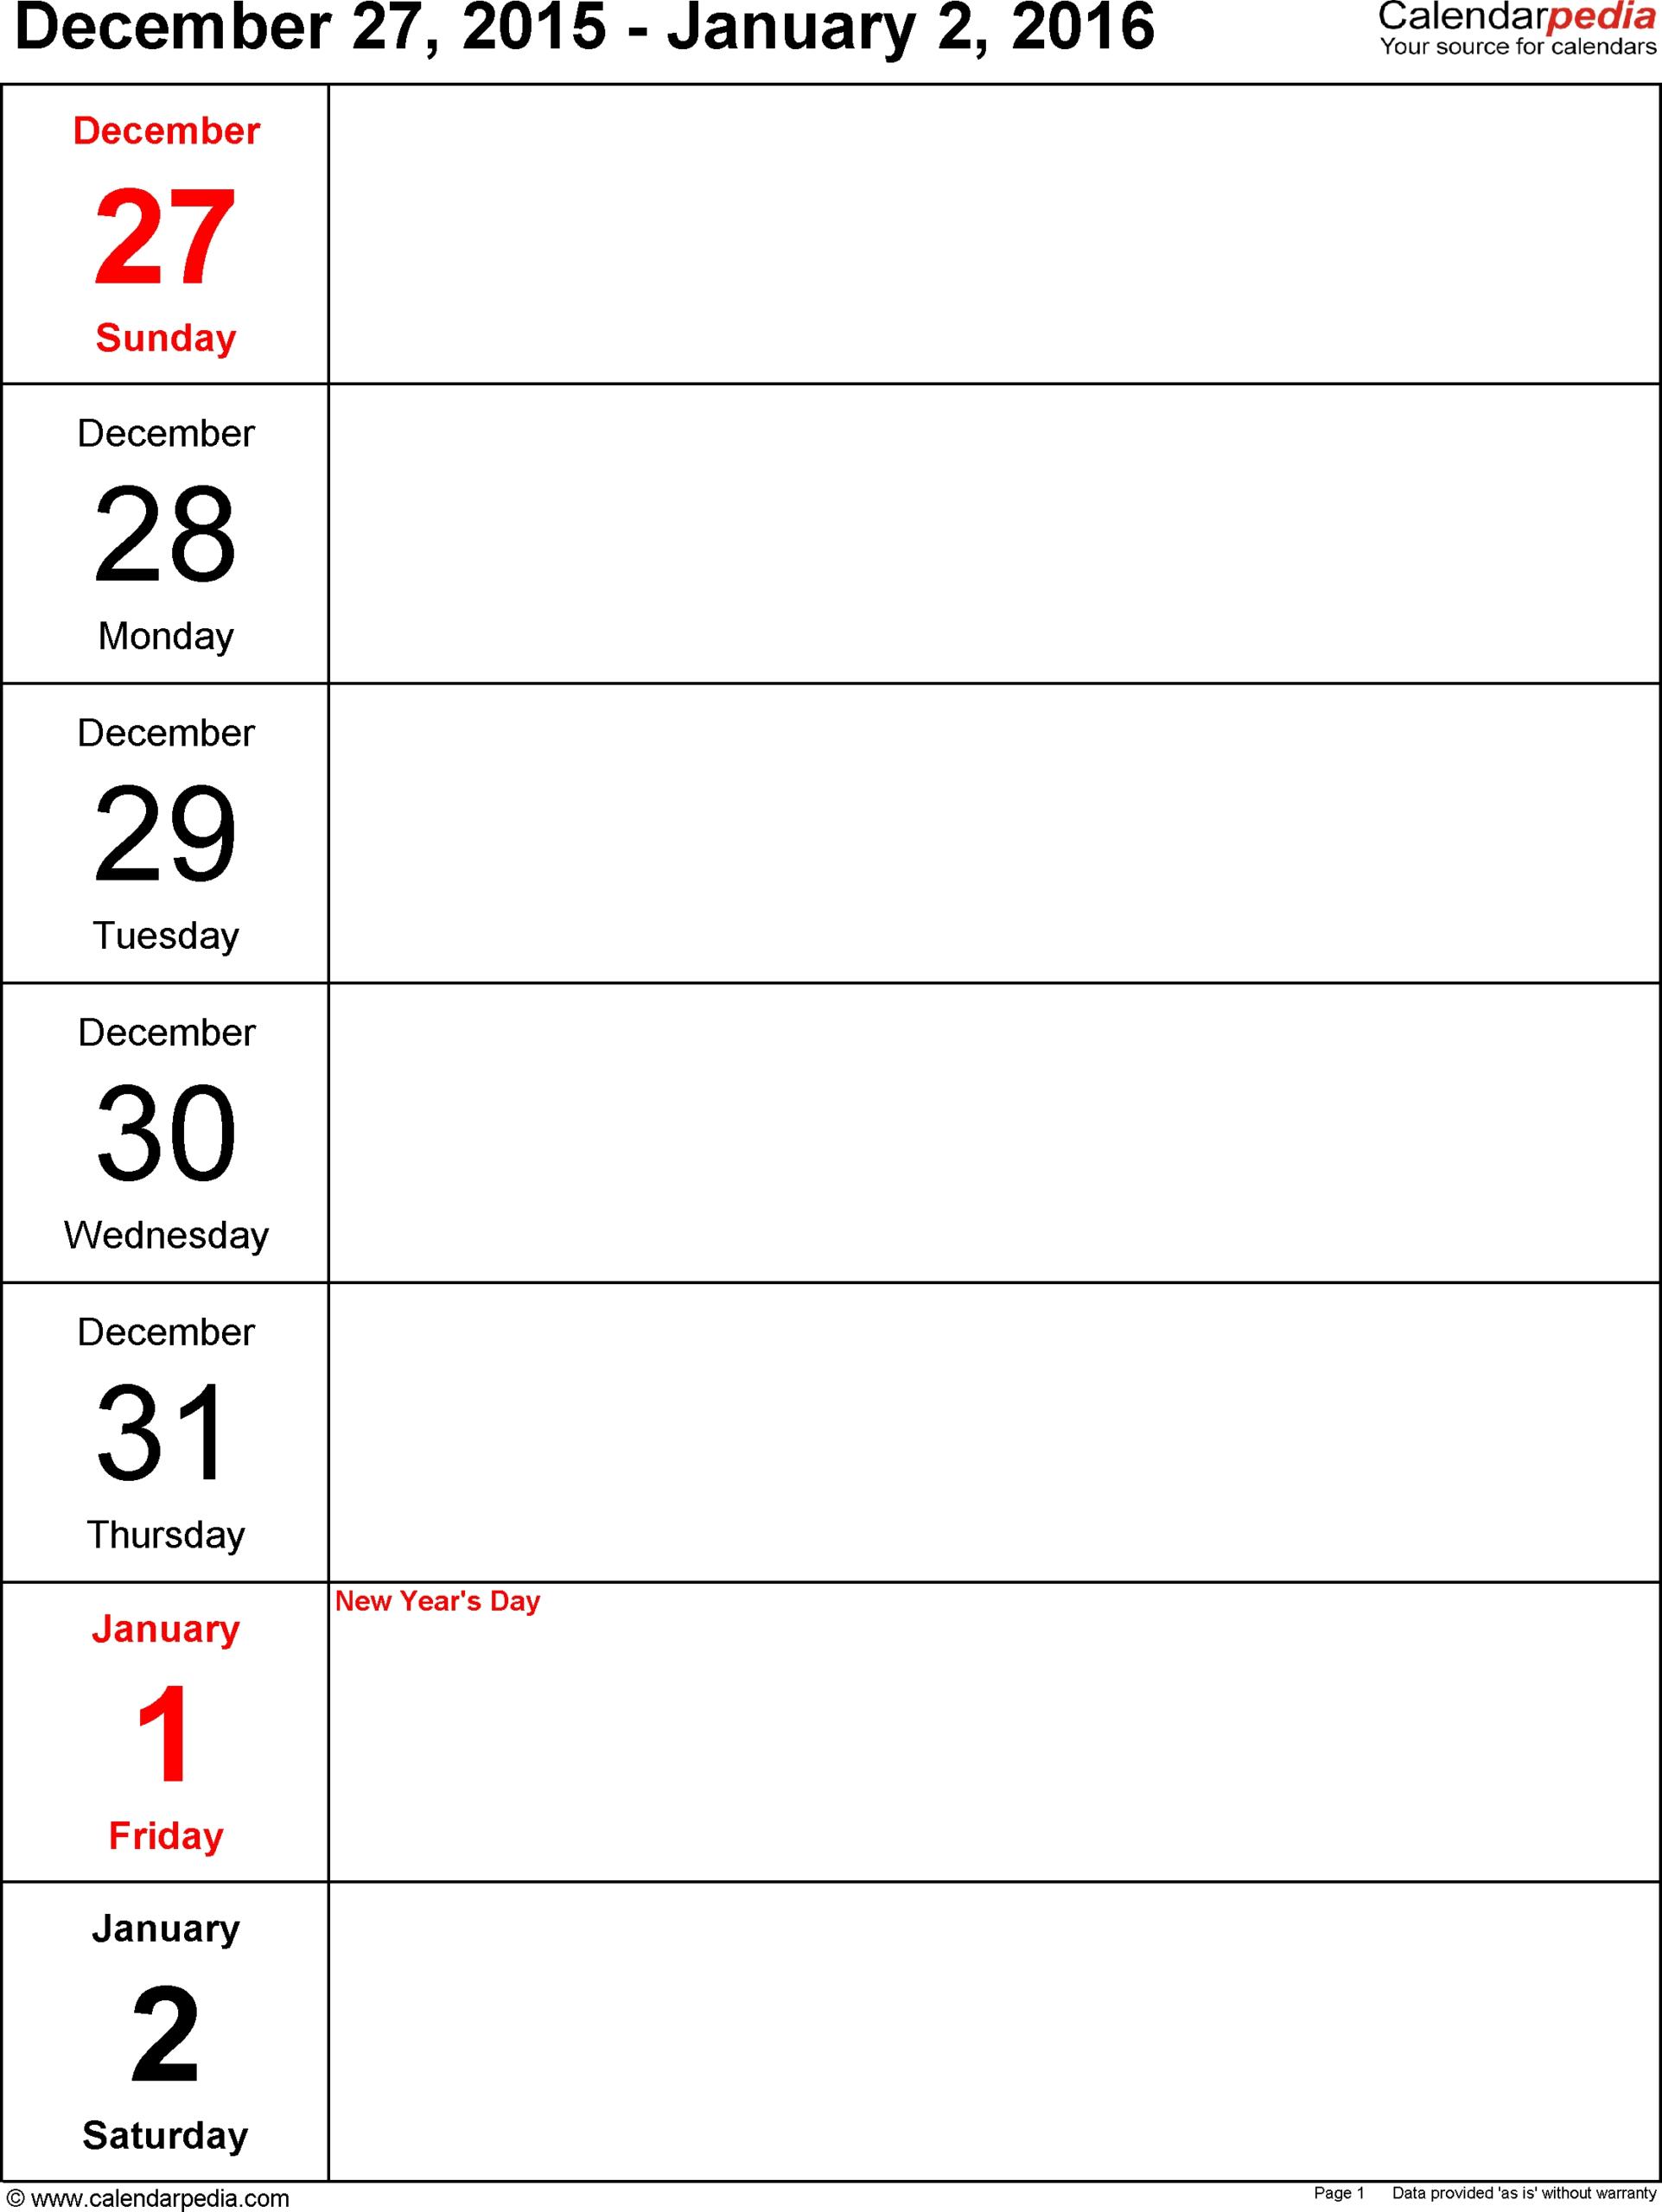 5 Day Calendar Template Word  Calendar Inspiration Design regarding Blank Calendar 5 Day Week